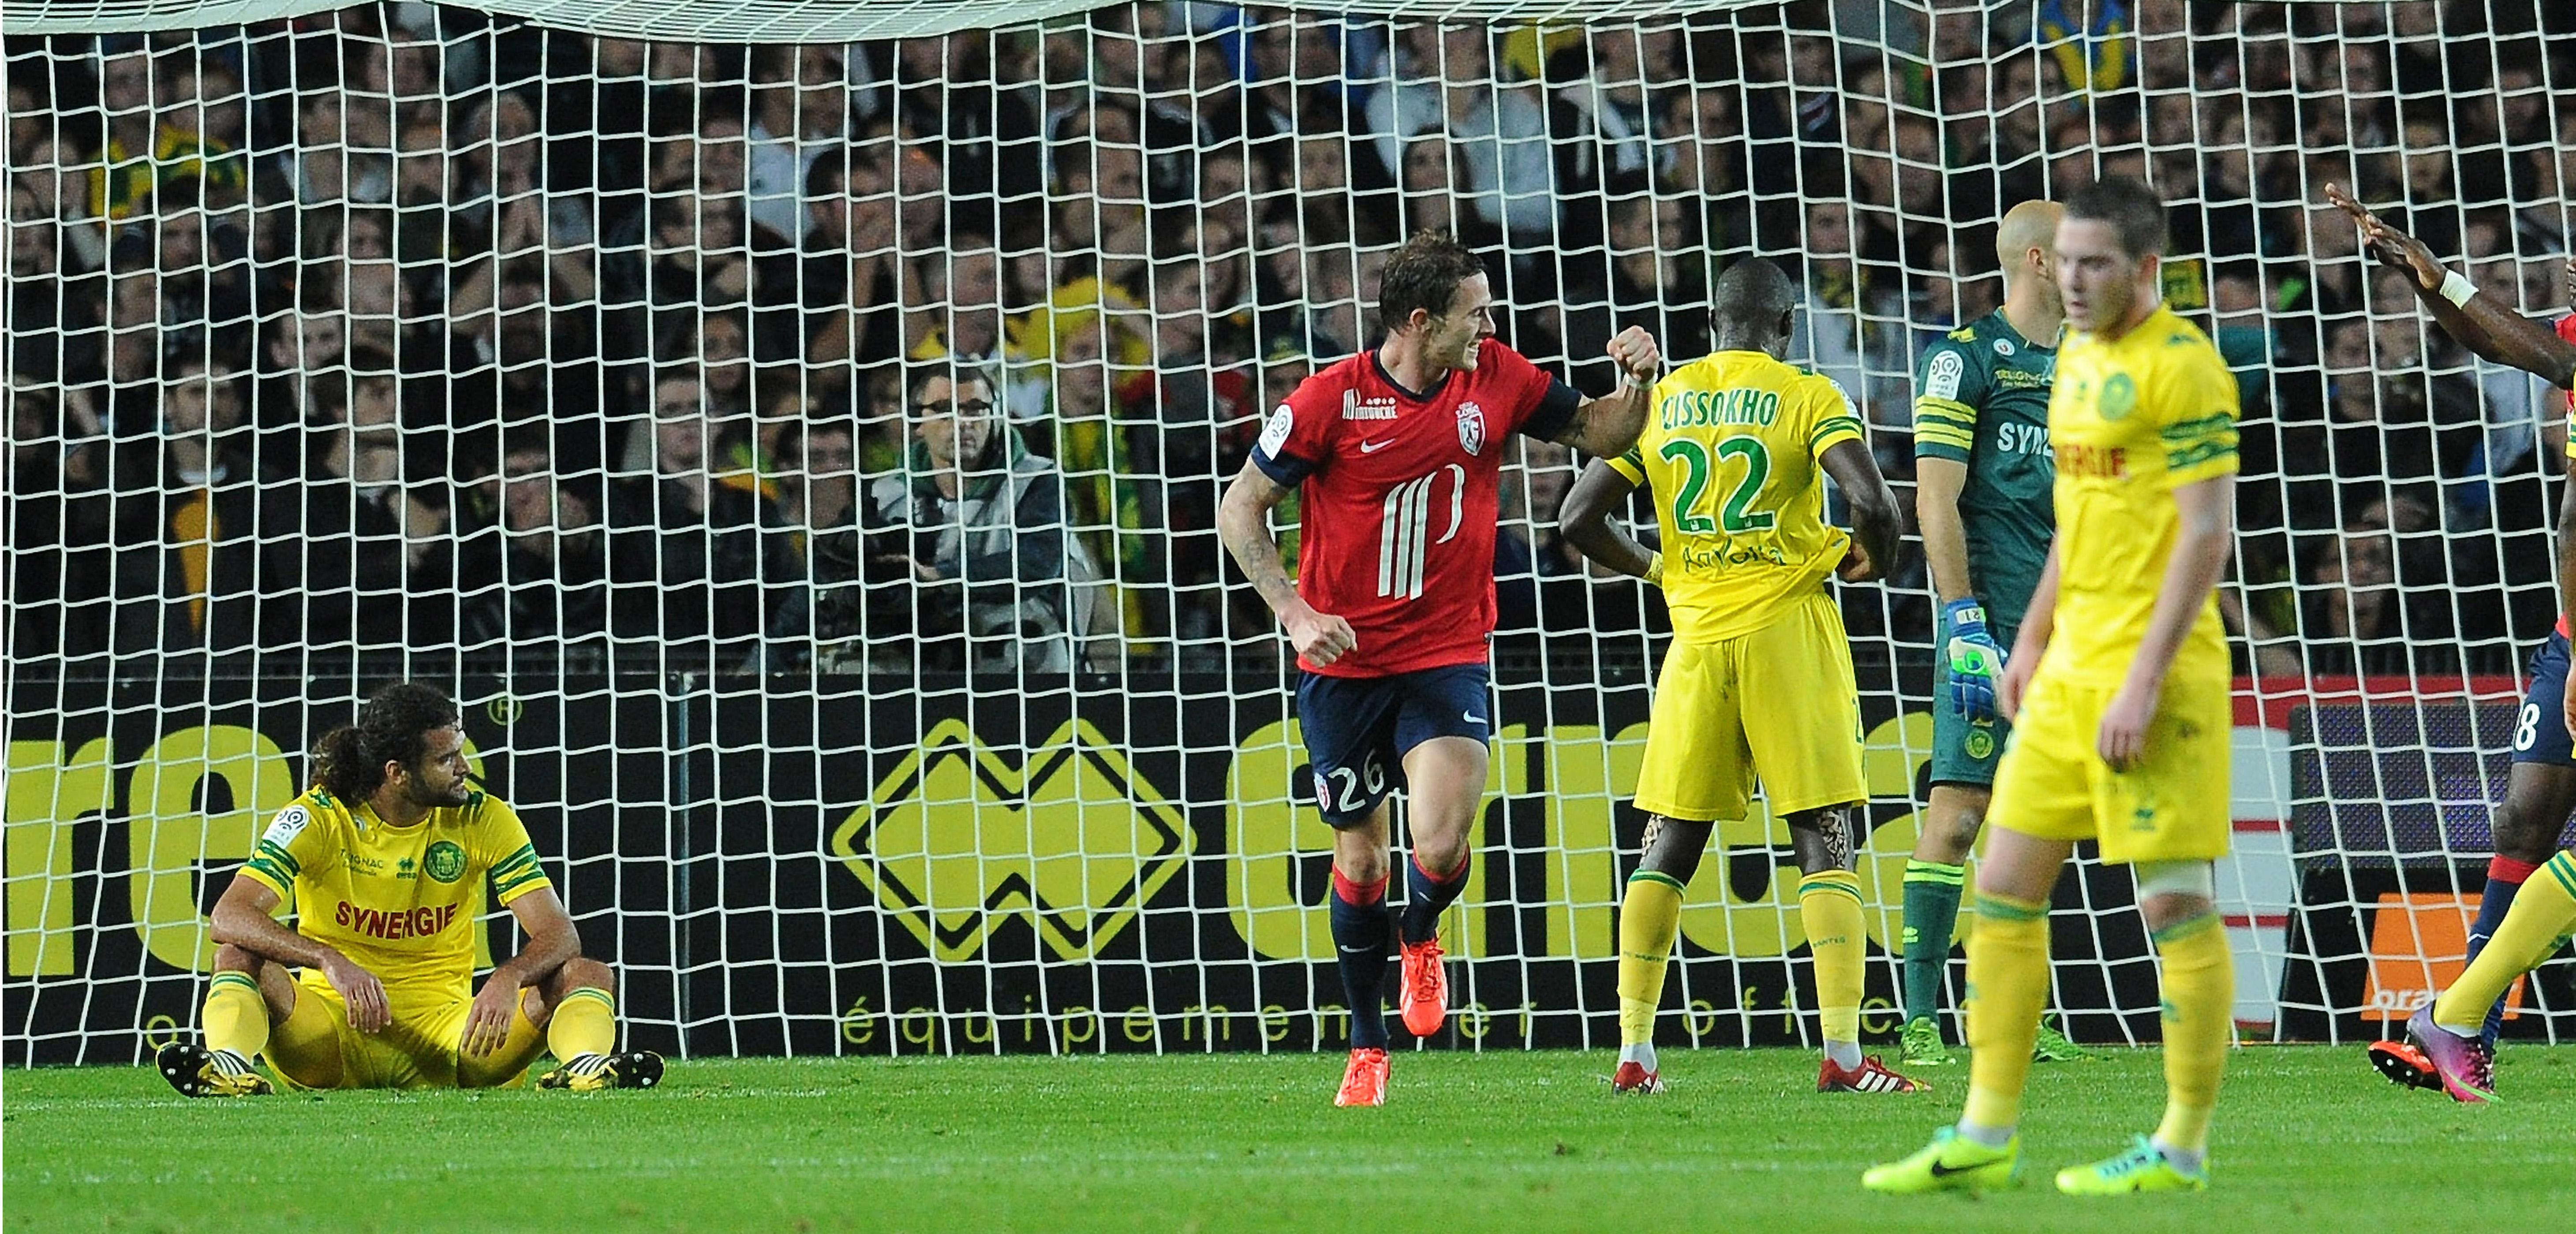 Match LOSC Lille FC Nantes en direct live streaming